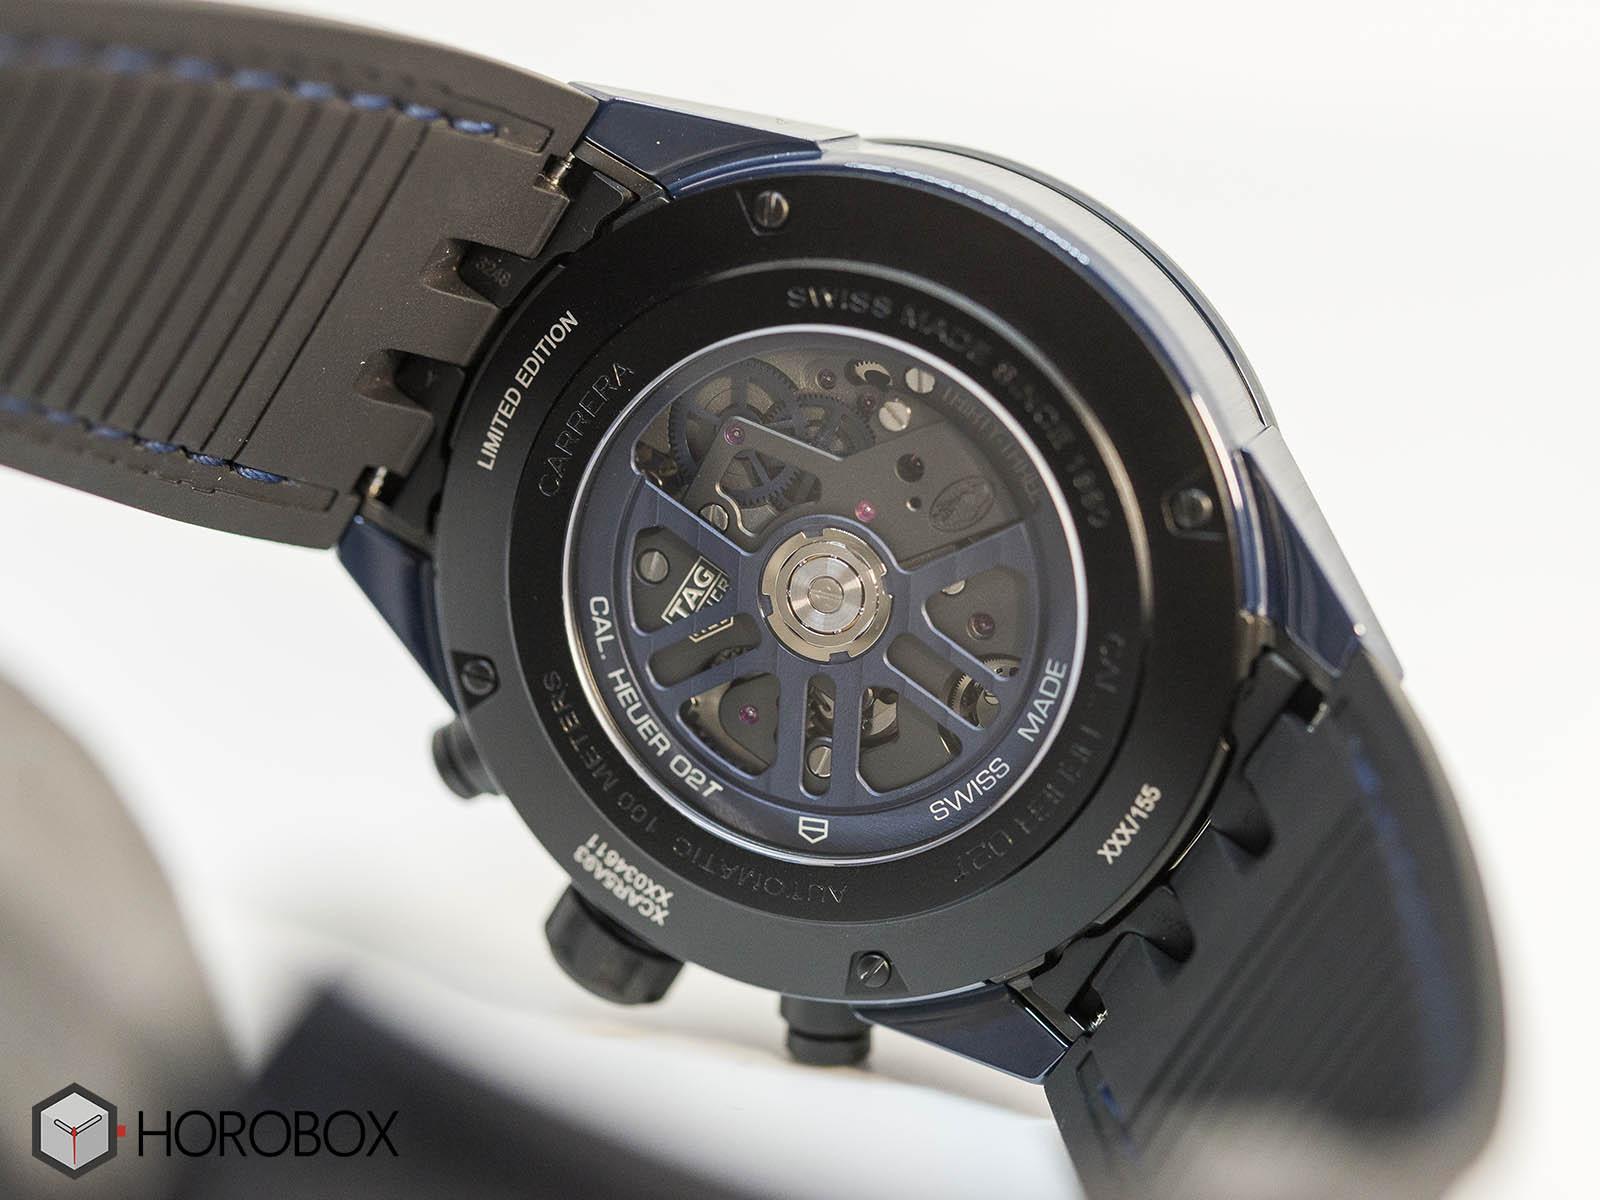 car5a93-fc6442-tag-heuer-carrera-chronograph-tourbillon-chronometer-8.jpg